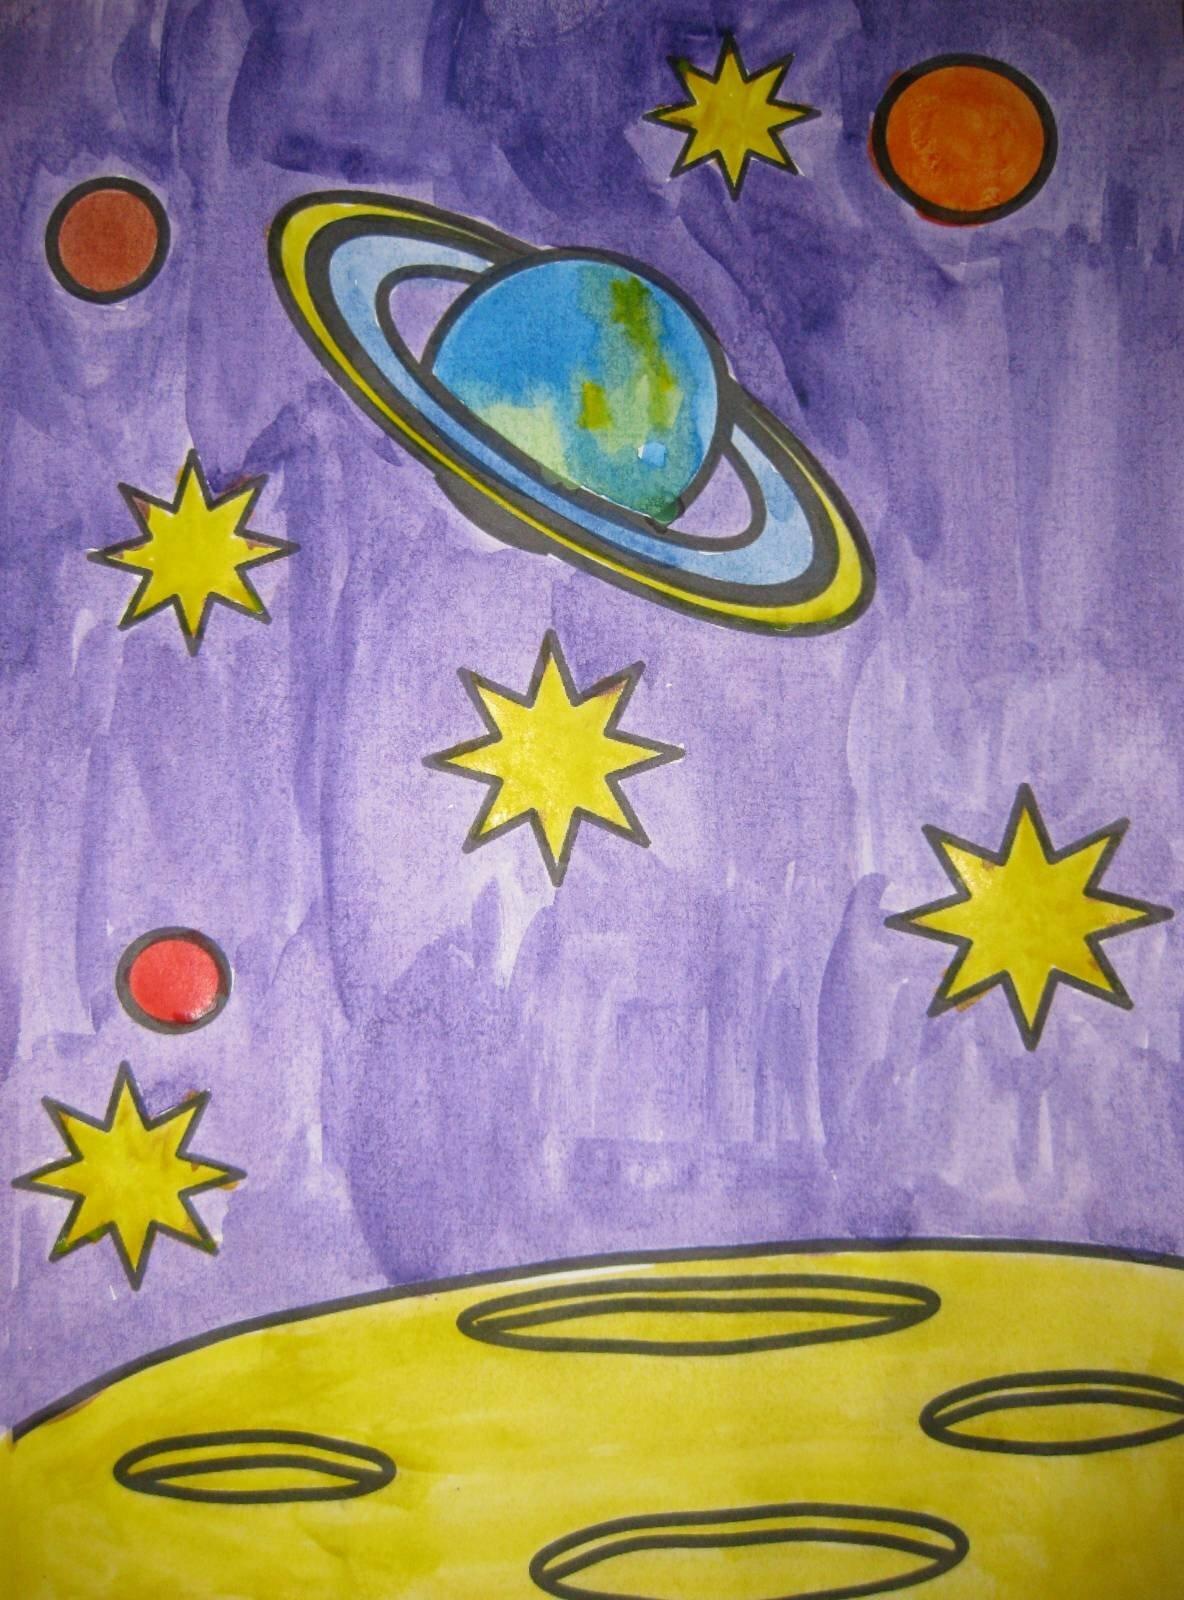 глубокому картинки день космонавтики 1 класс или потолок комнате